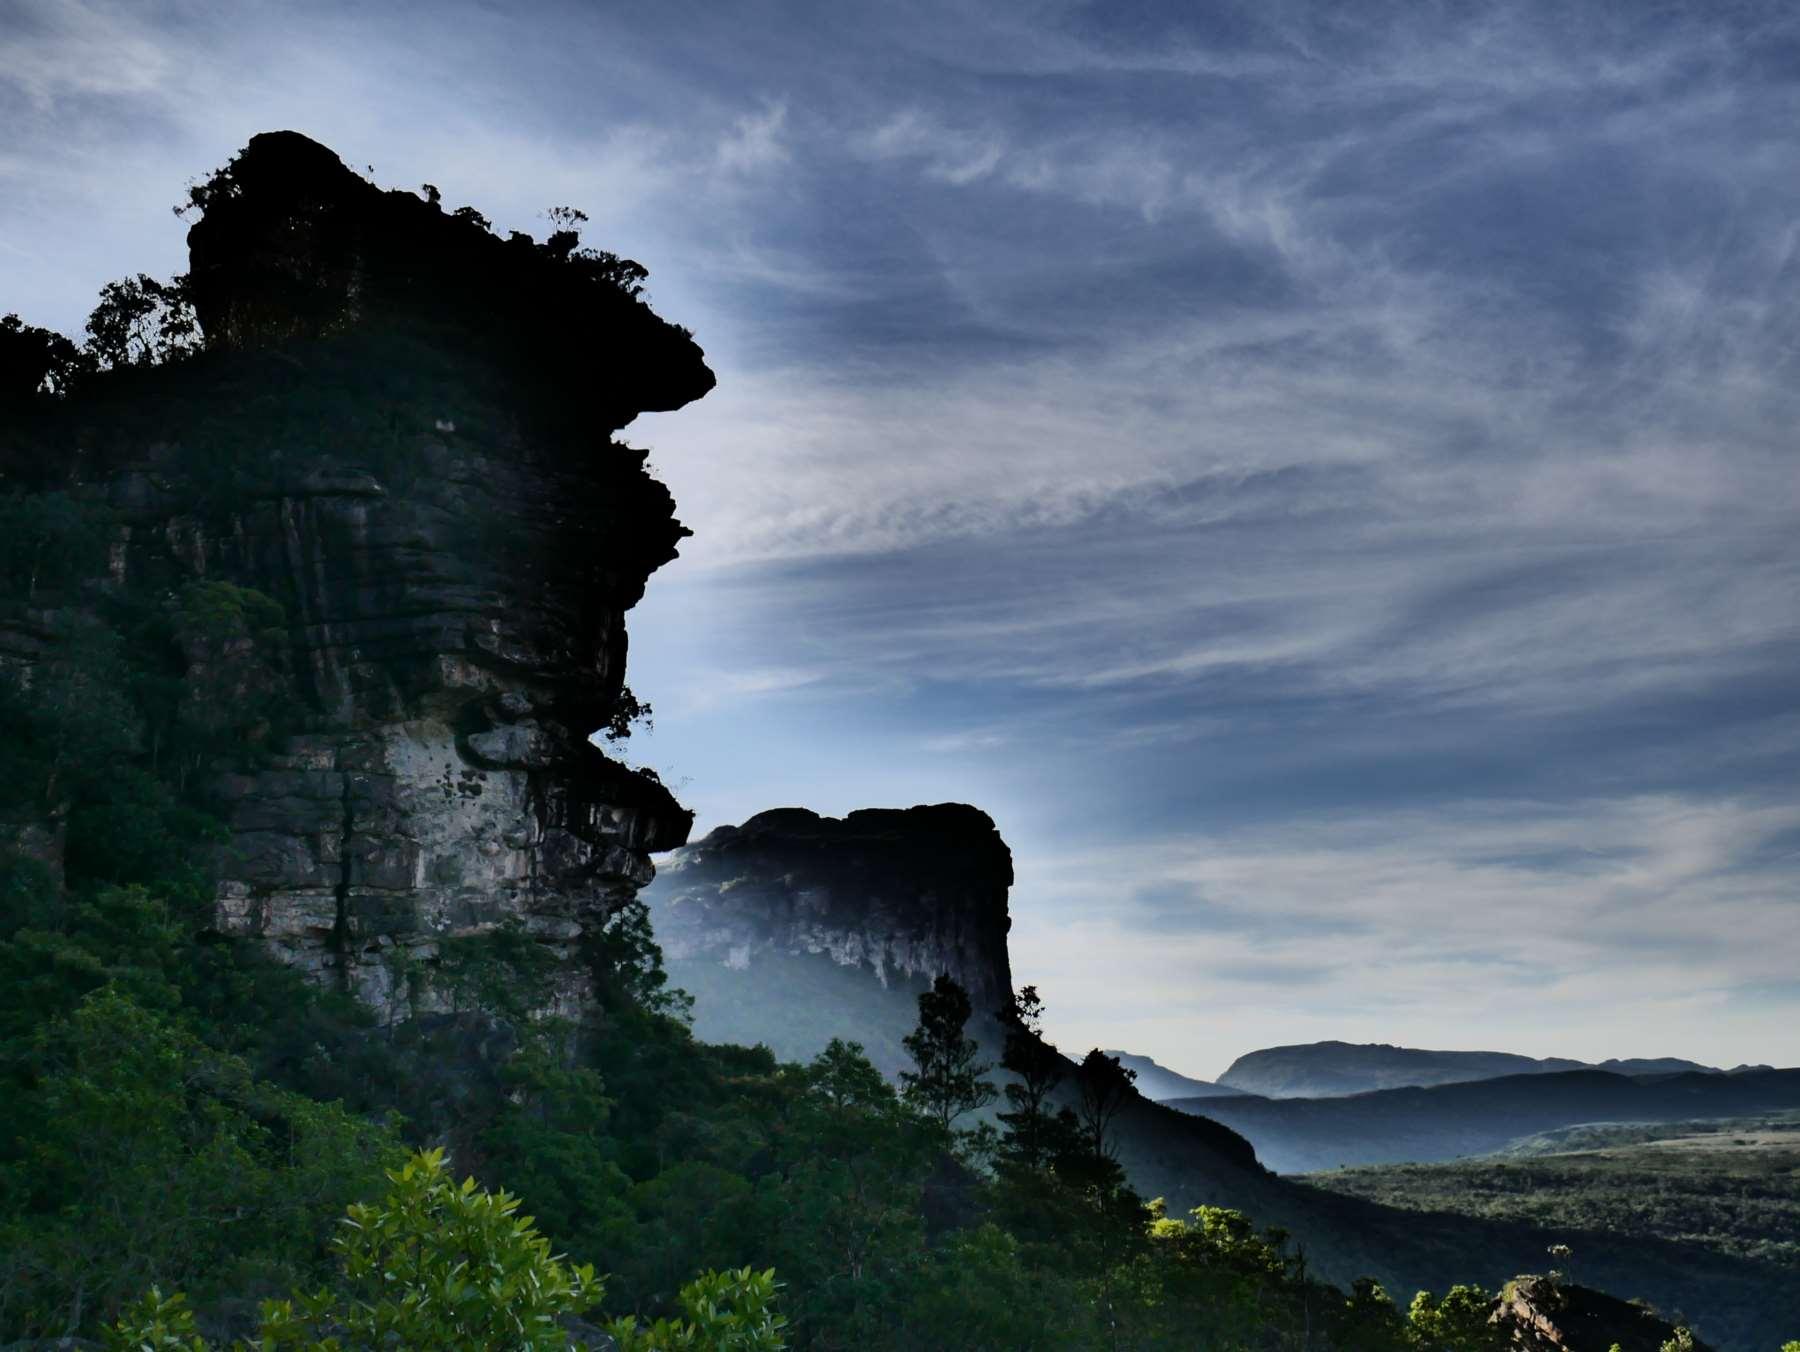 Em cima do Morro do Castelo, Vale do Pati, Chapada Diamantina, Bahia, Bahia, Brazil